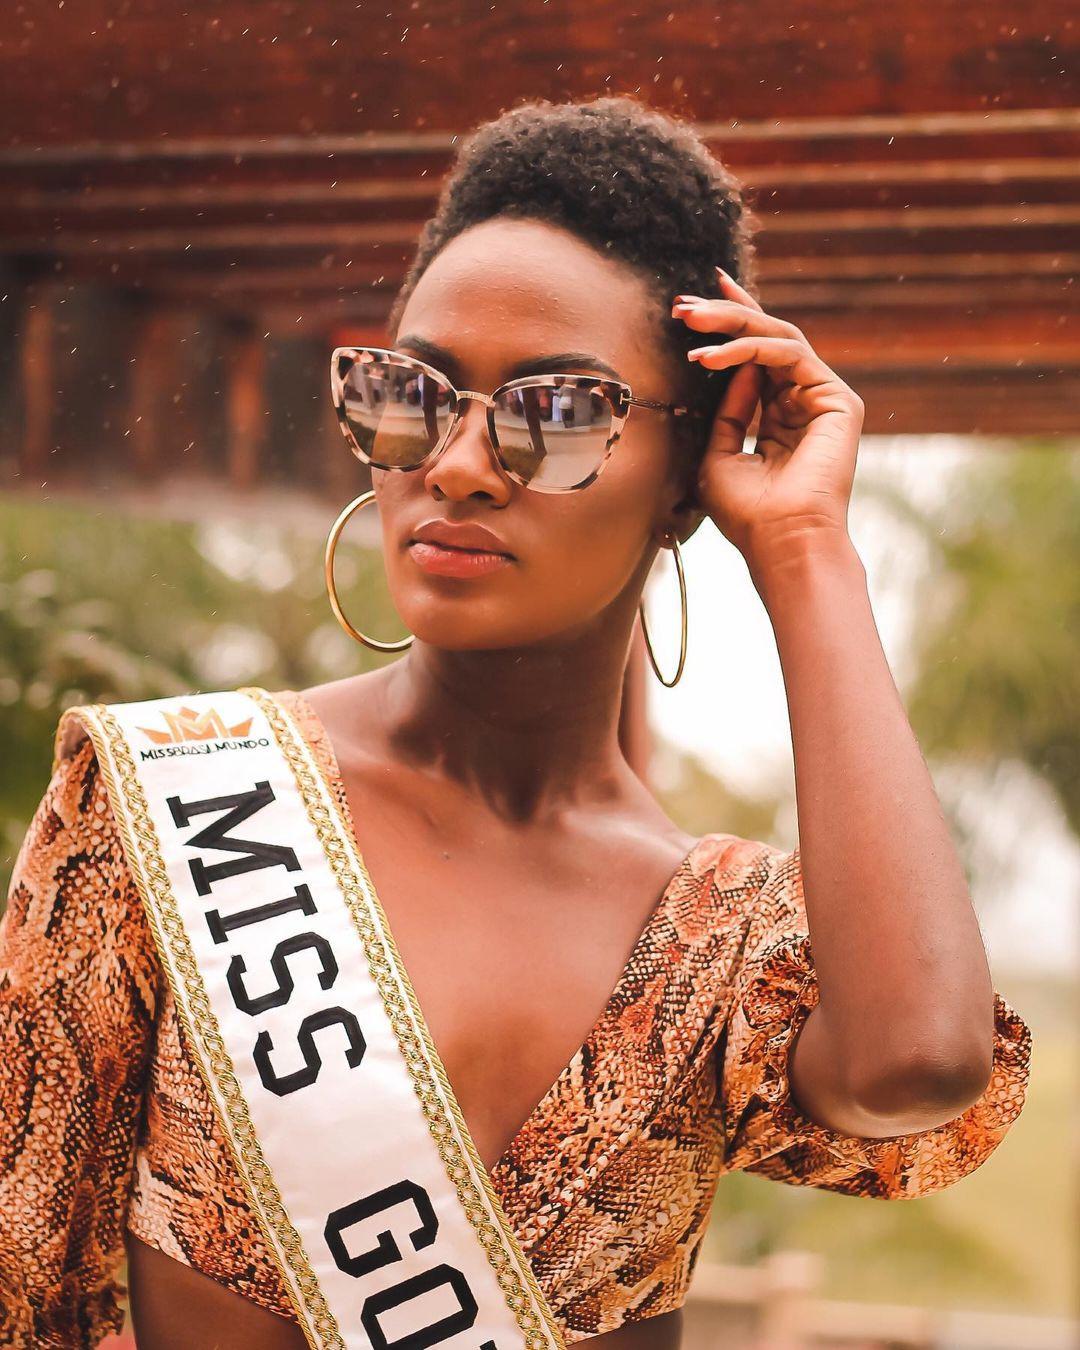 fernanda bispo, top 20 de miss brasil mundo 2019. - Página 4 F0d9r410